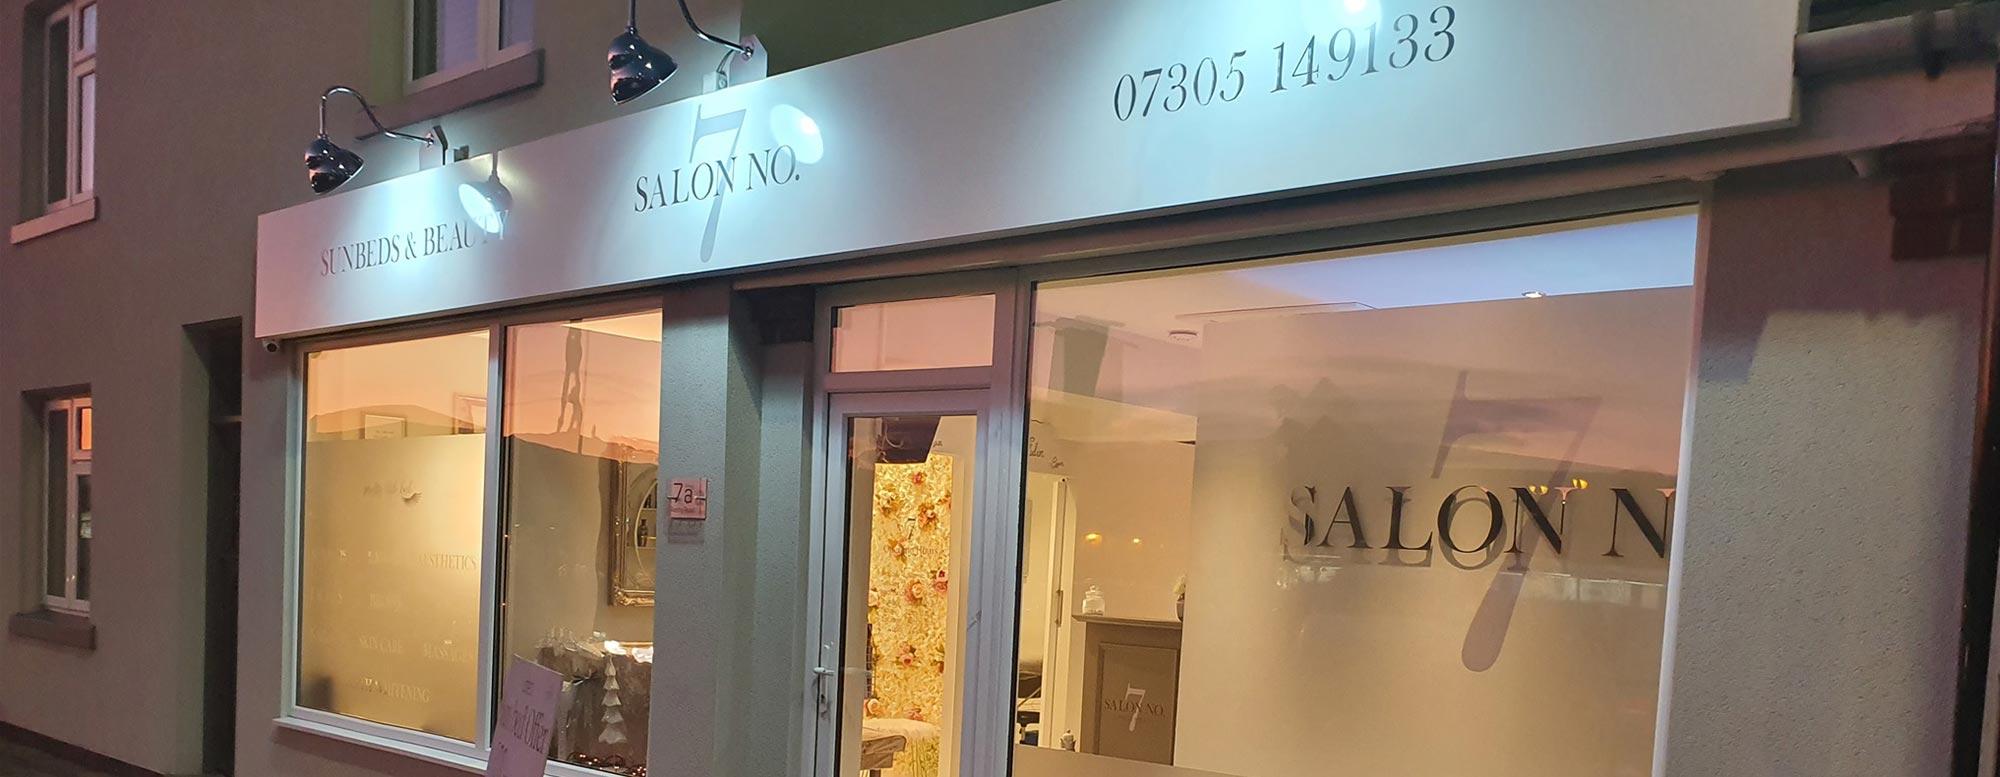 Salon No 7 shop and window graphics